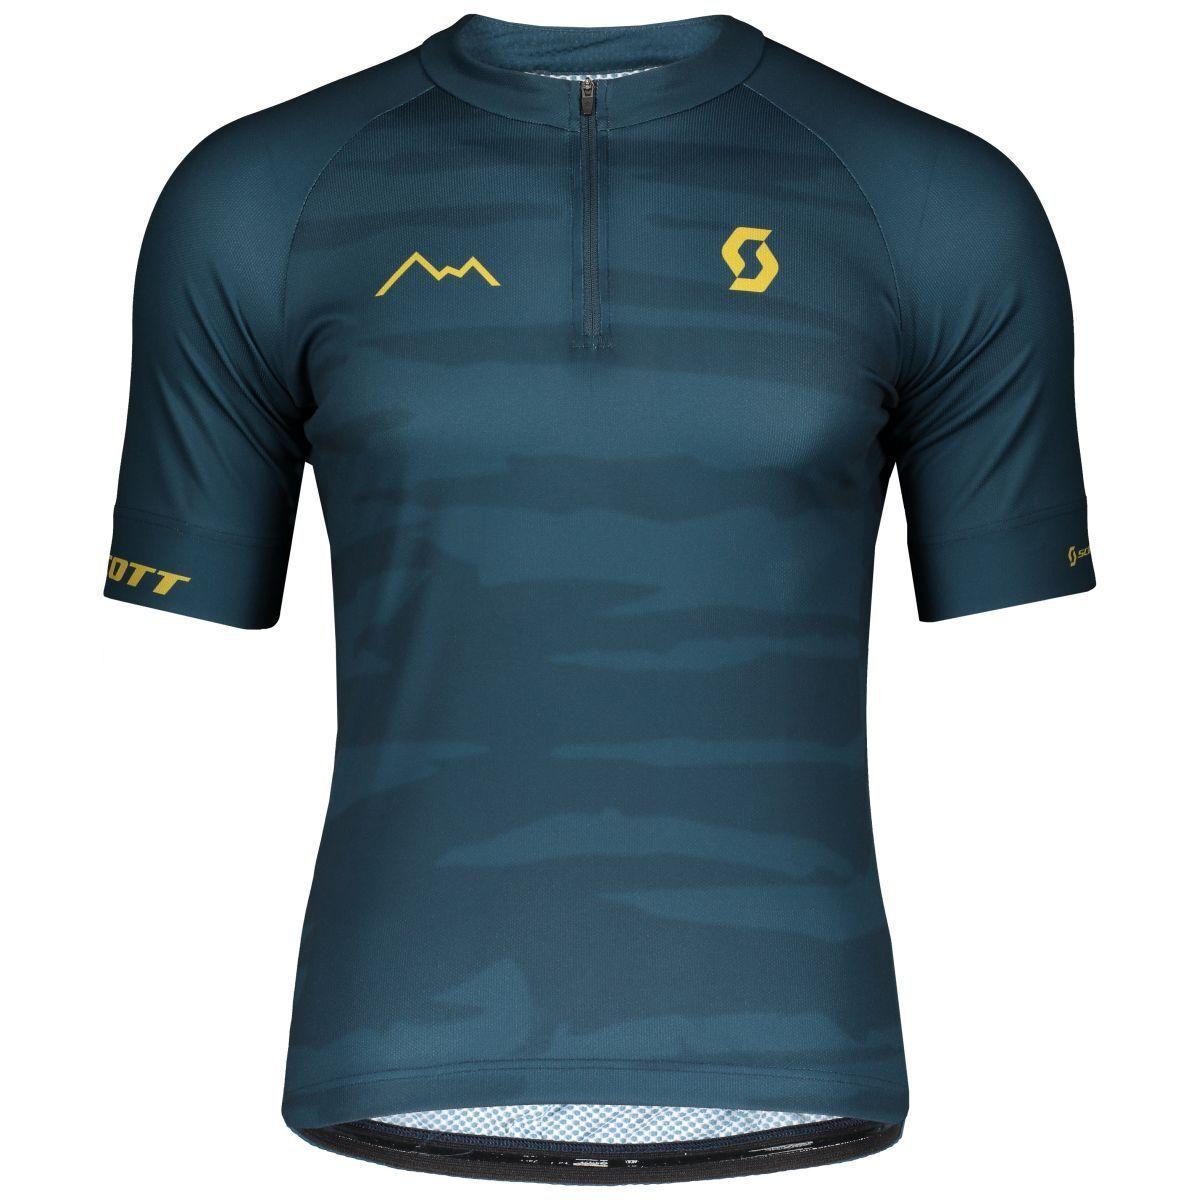 Scott Endurance 20 Fahrrad Trikot kurz blau 2019 2019 2019 d2481d